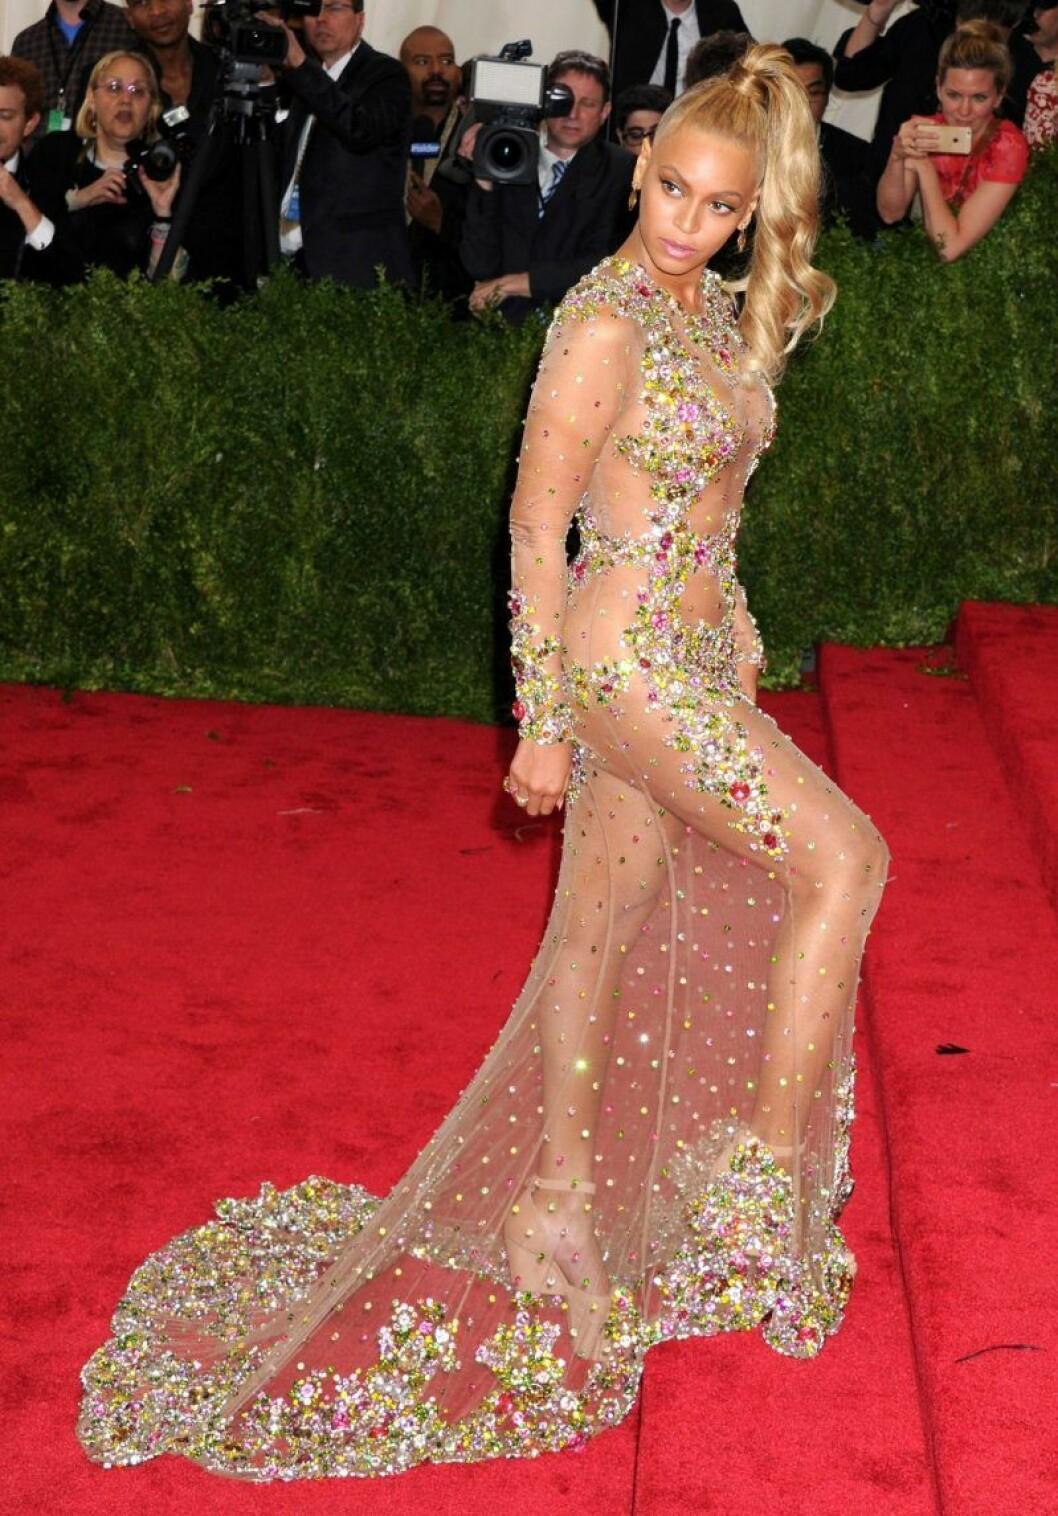 Beyoncé poserar i trappan på Met-galan i en genomskinlig kreation.